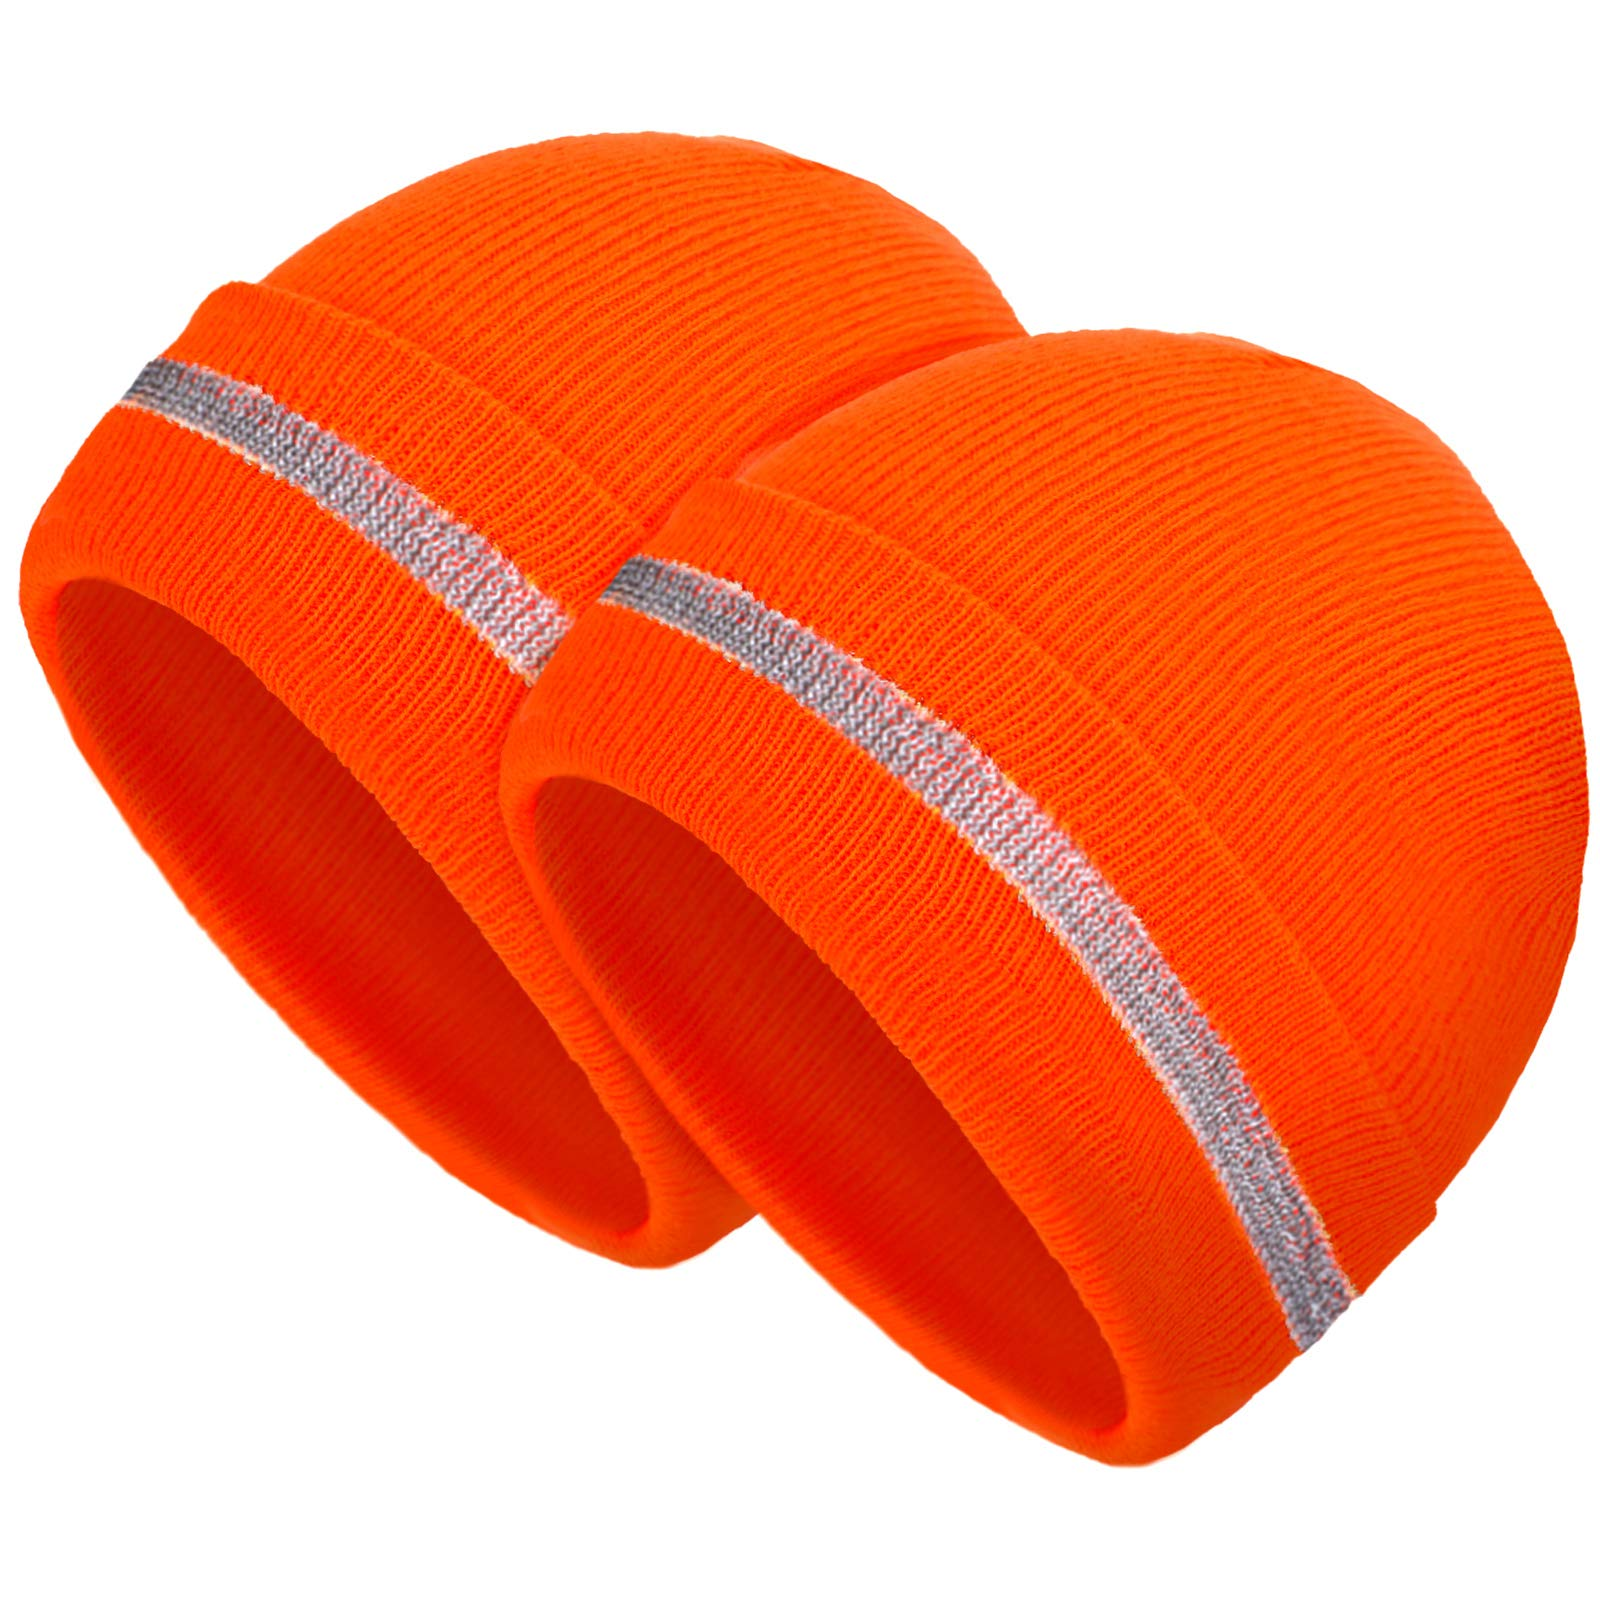 Geyoga 2 Pieces Adult Reflective Knit Beanie Hats Warm Winter Hats Headwear for Work,Running